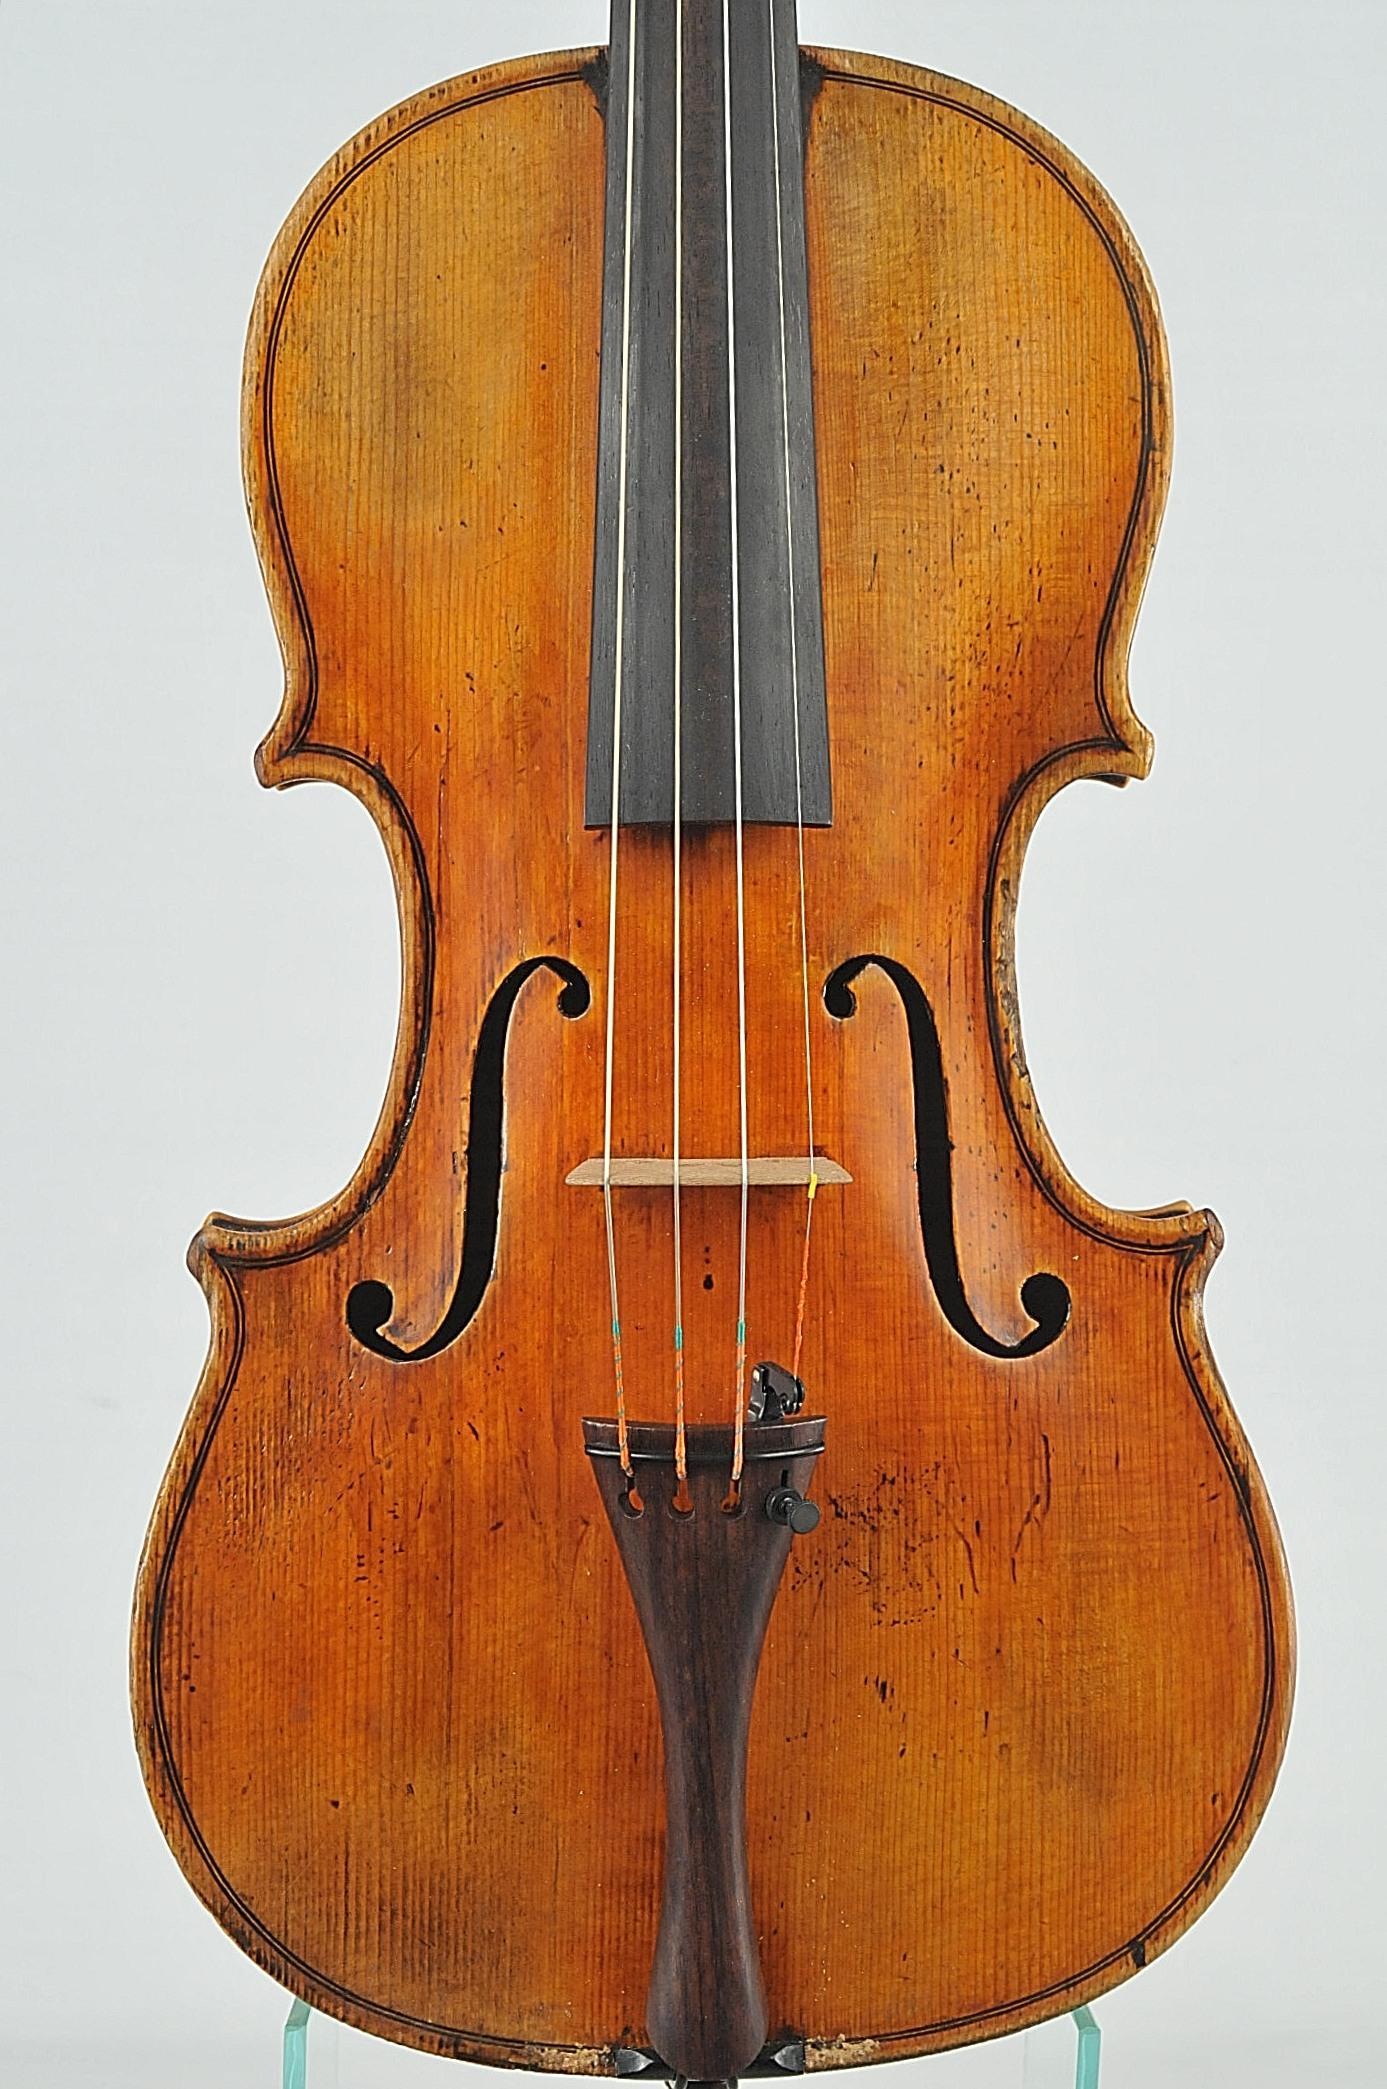 Papp Sándor from Budapest 1924 Violin